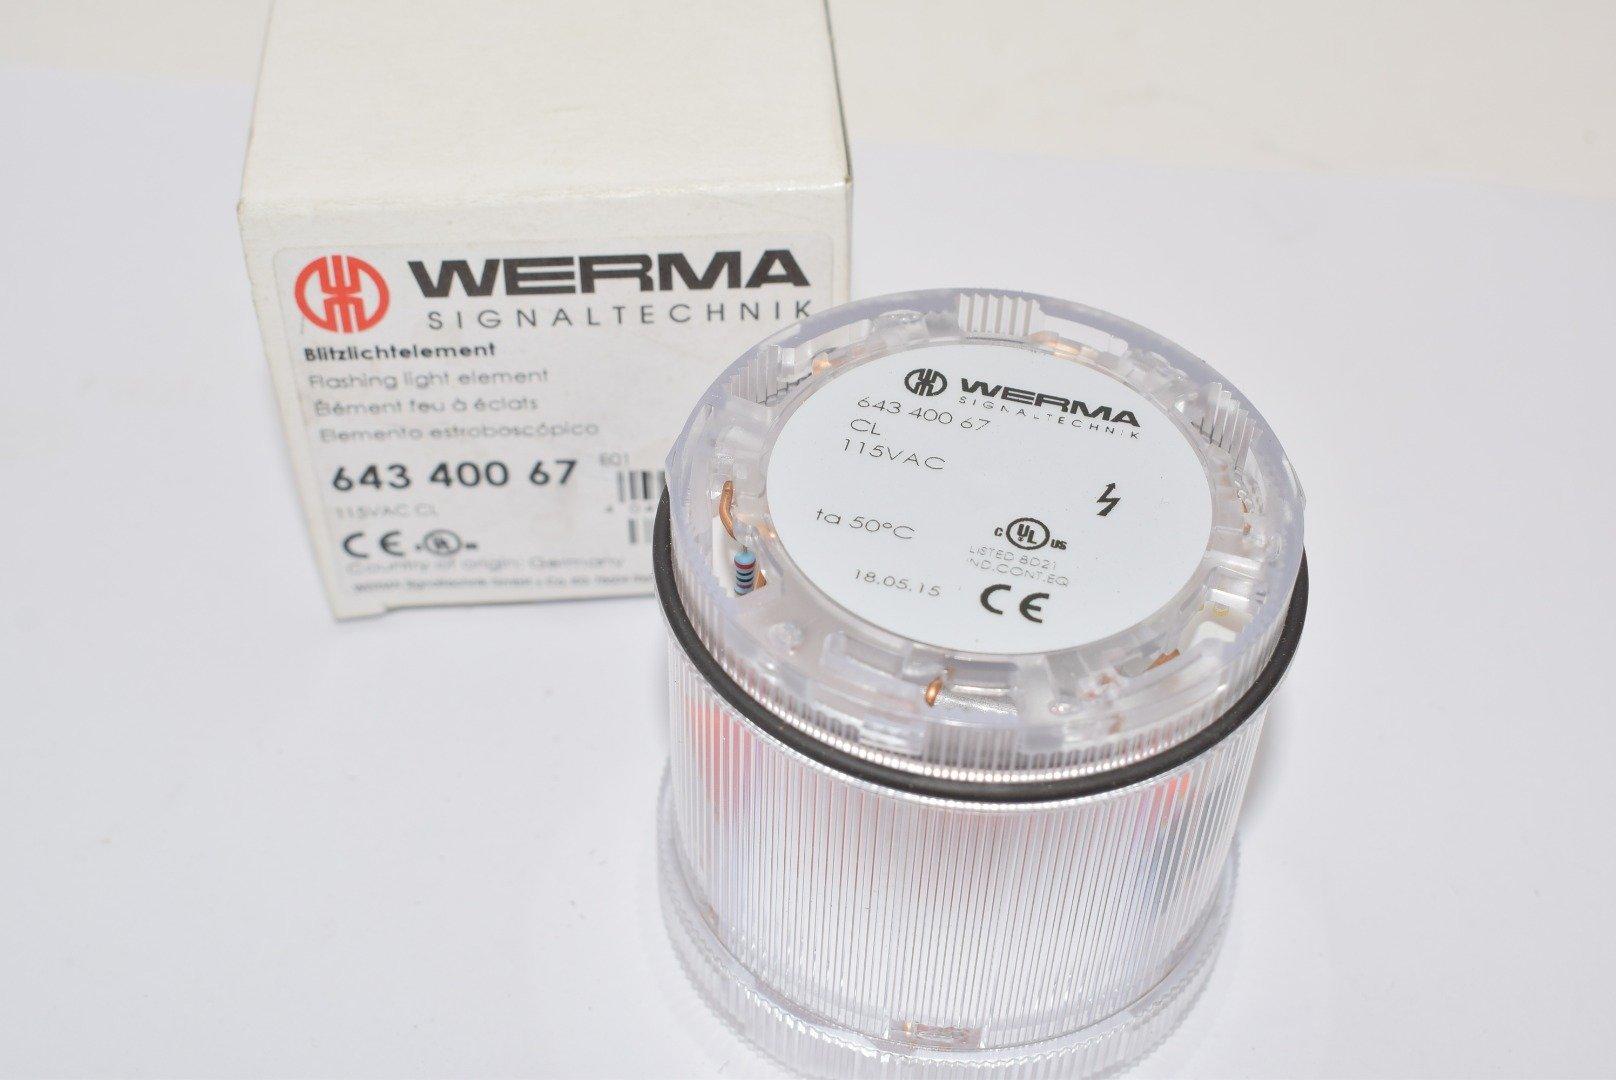 WERMA 64340067 Stack Light; KombiSIGN 71; Xenon Flashing Light Element; 115VAC; Clear